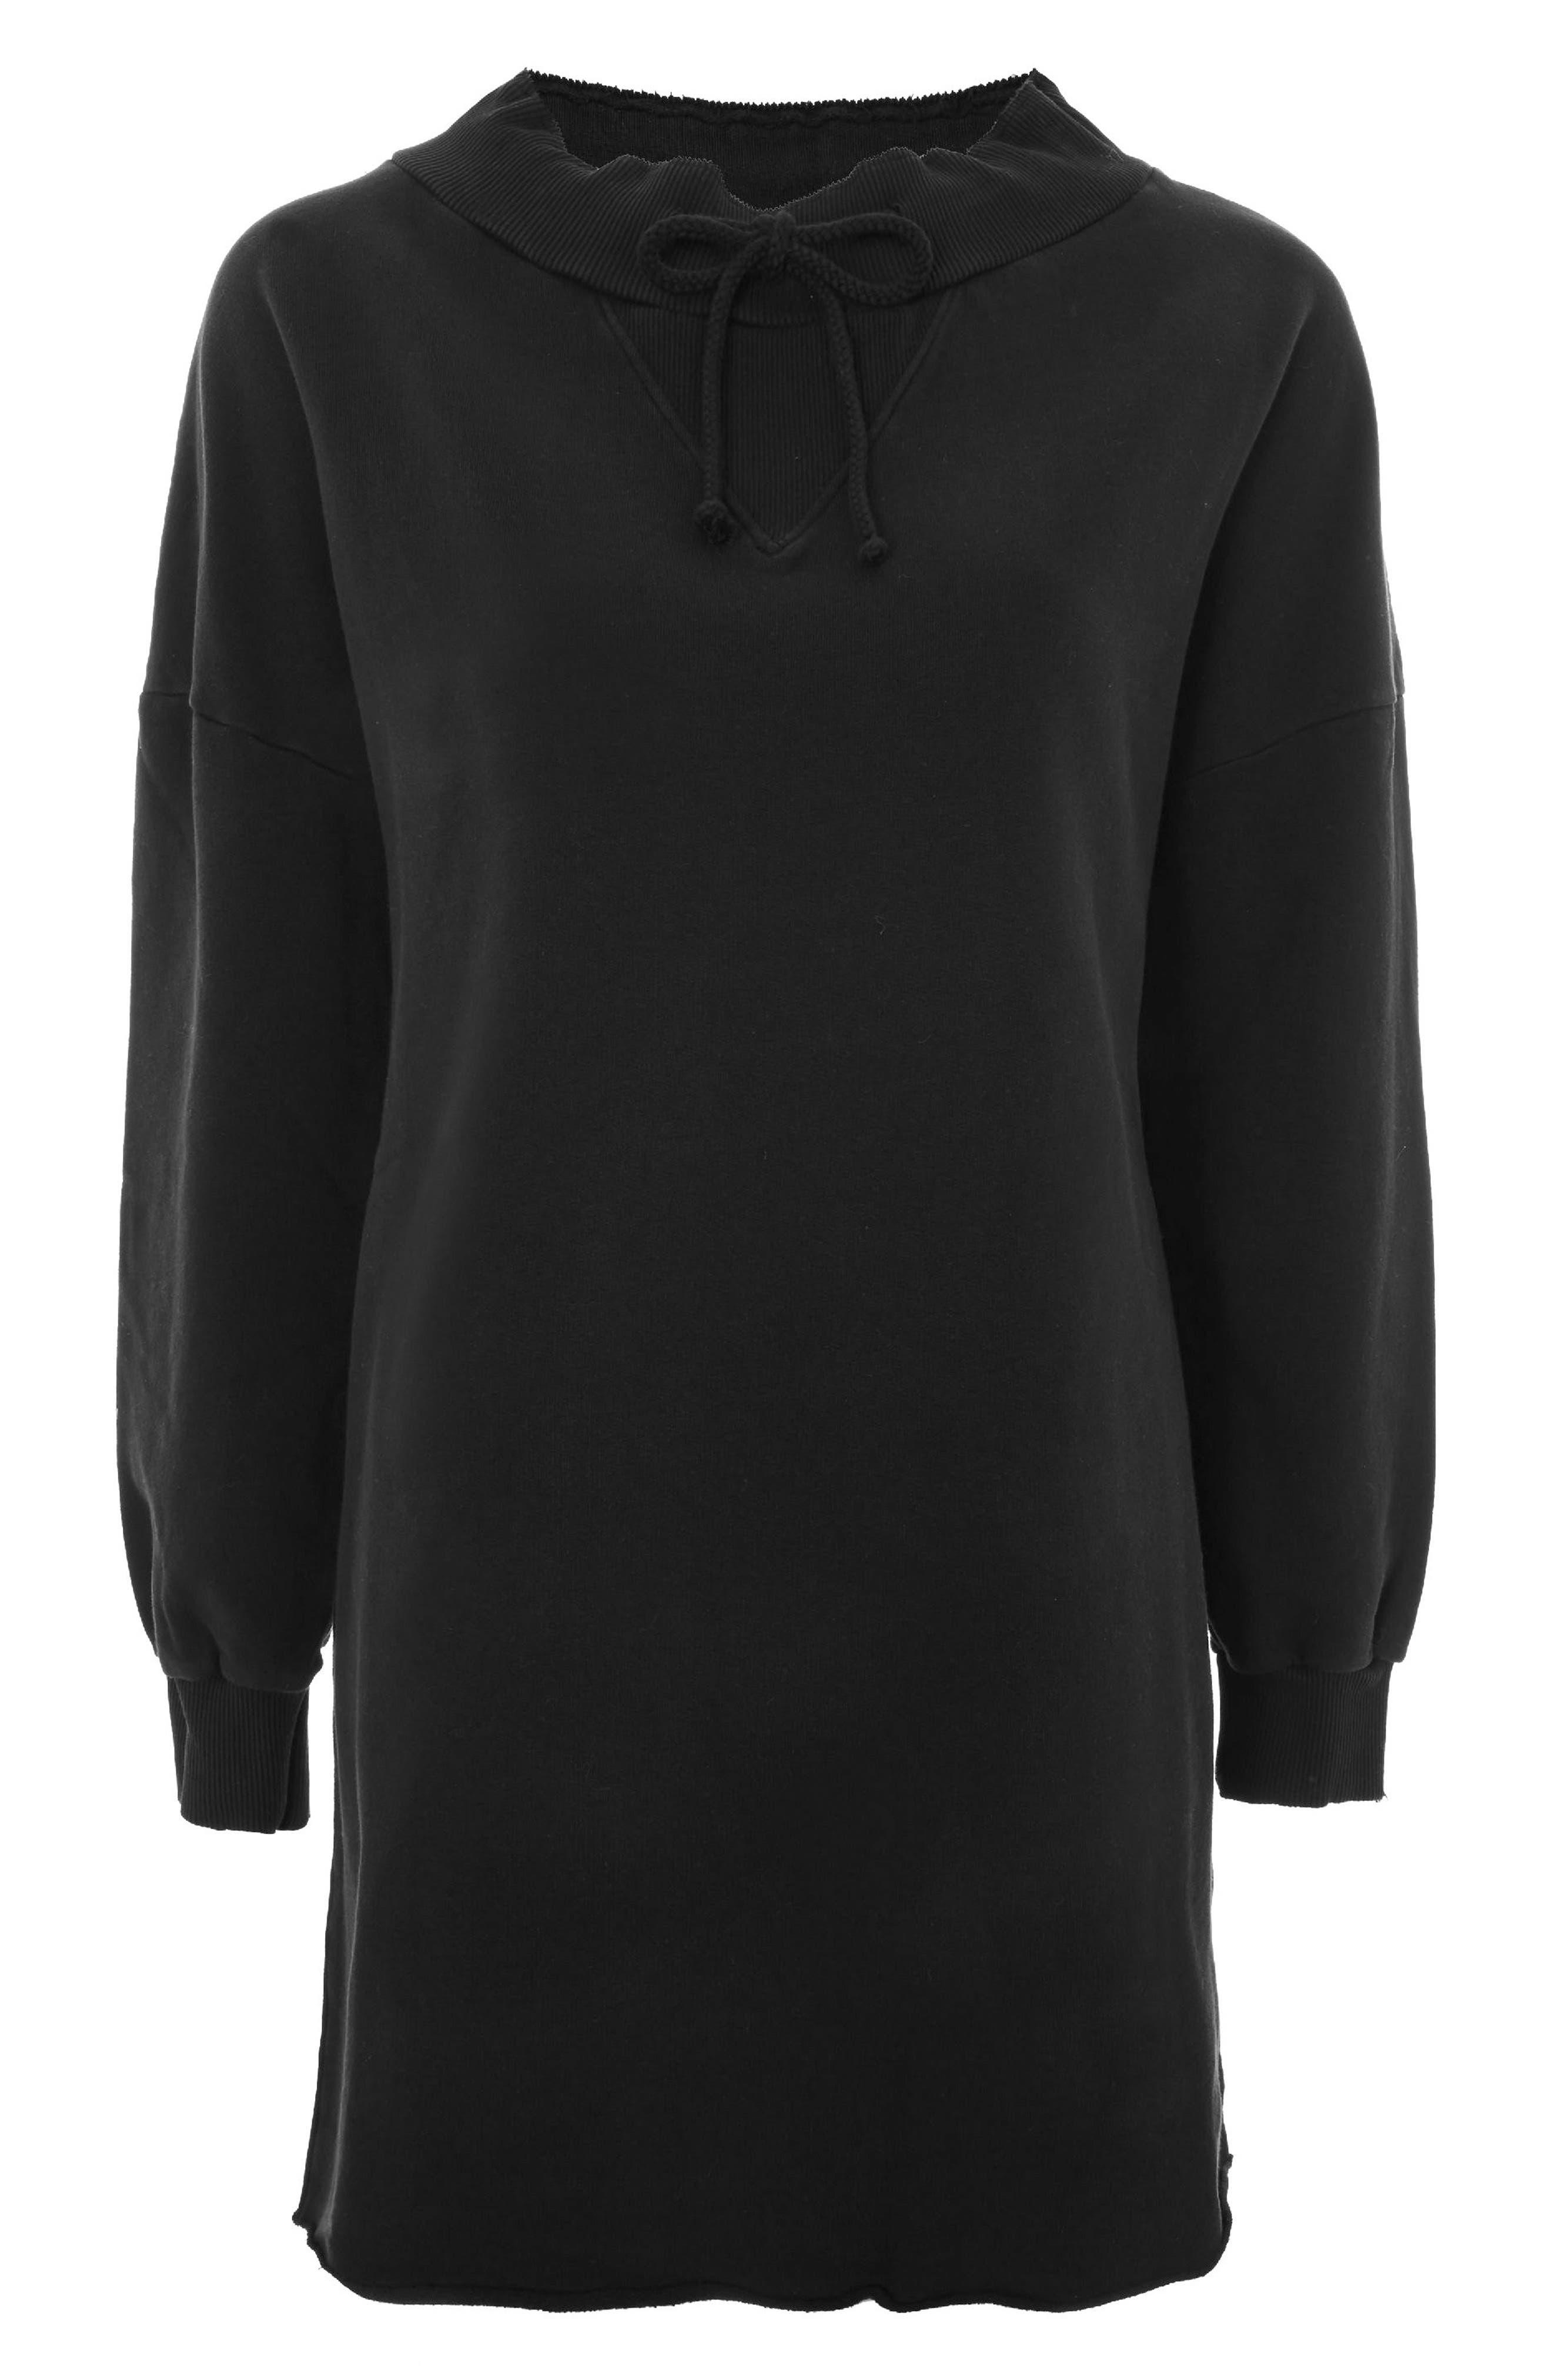 Main Image - Topshop Boutique Drawstring Sweater Dress